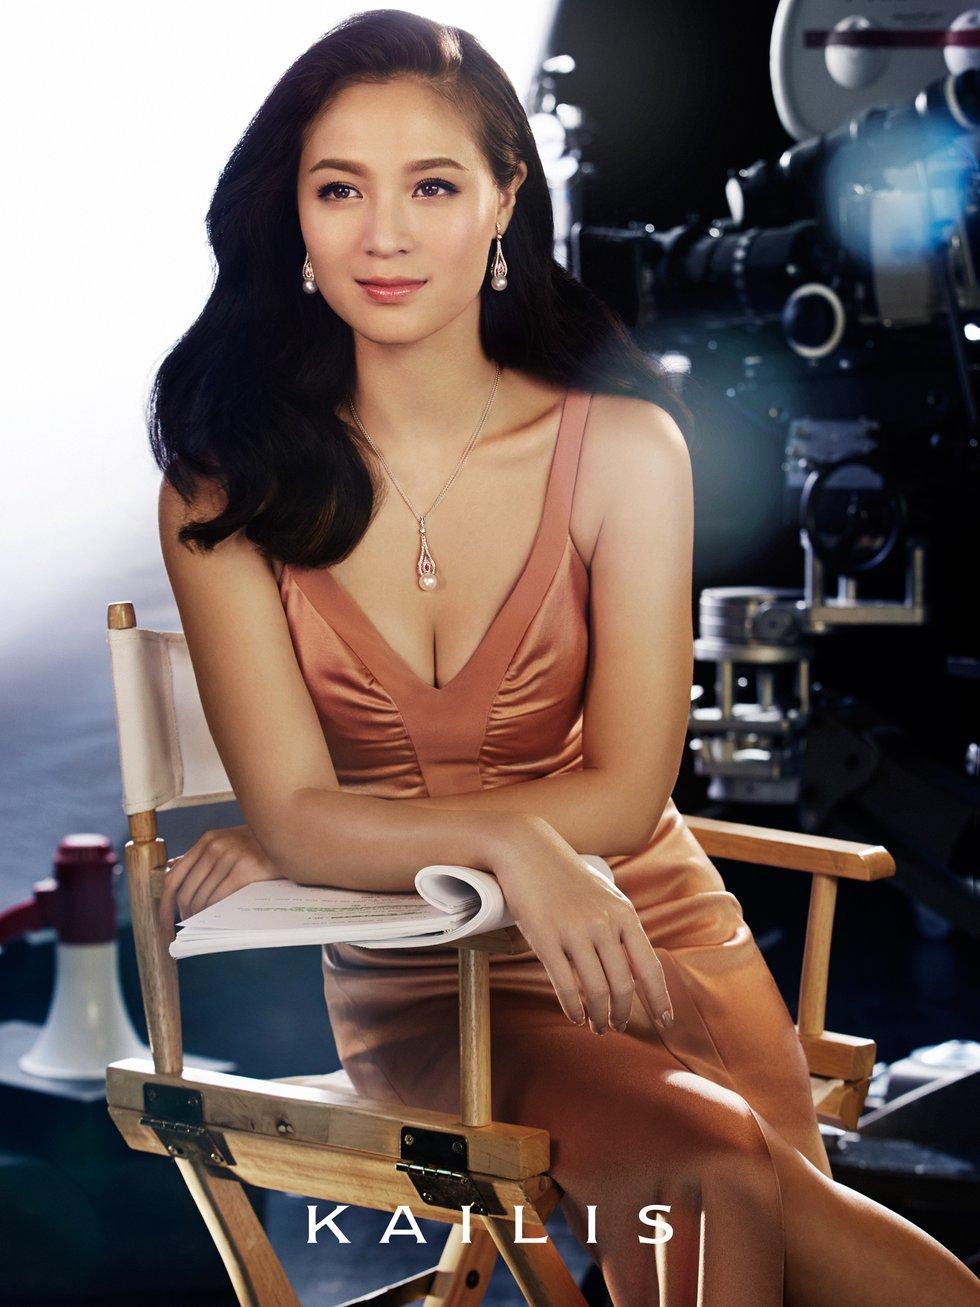 Kailis Pearls campaign image